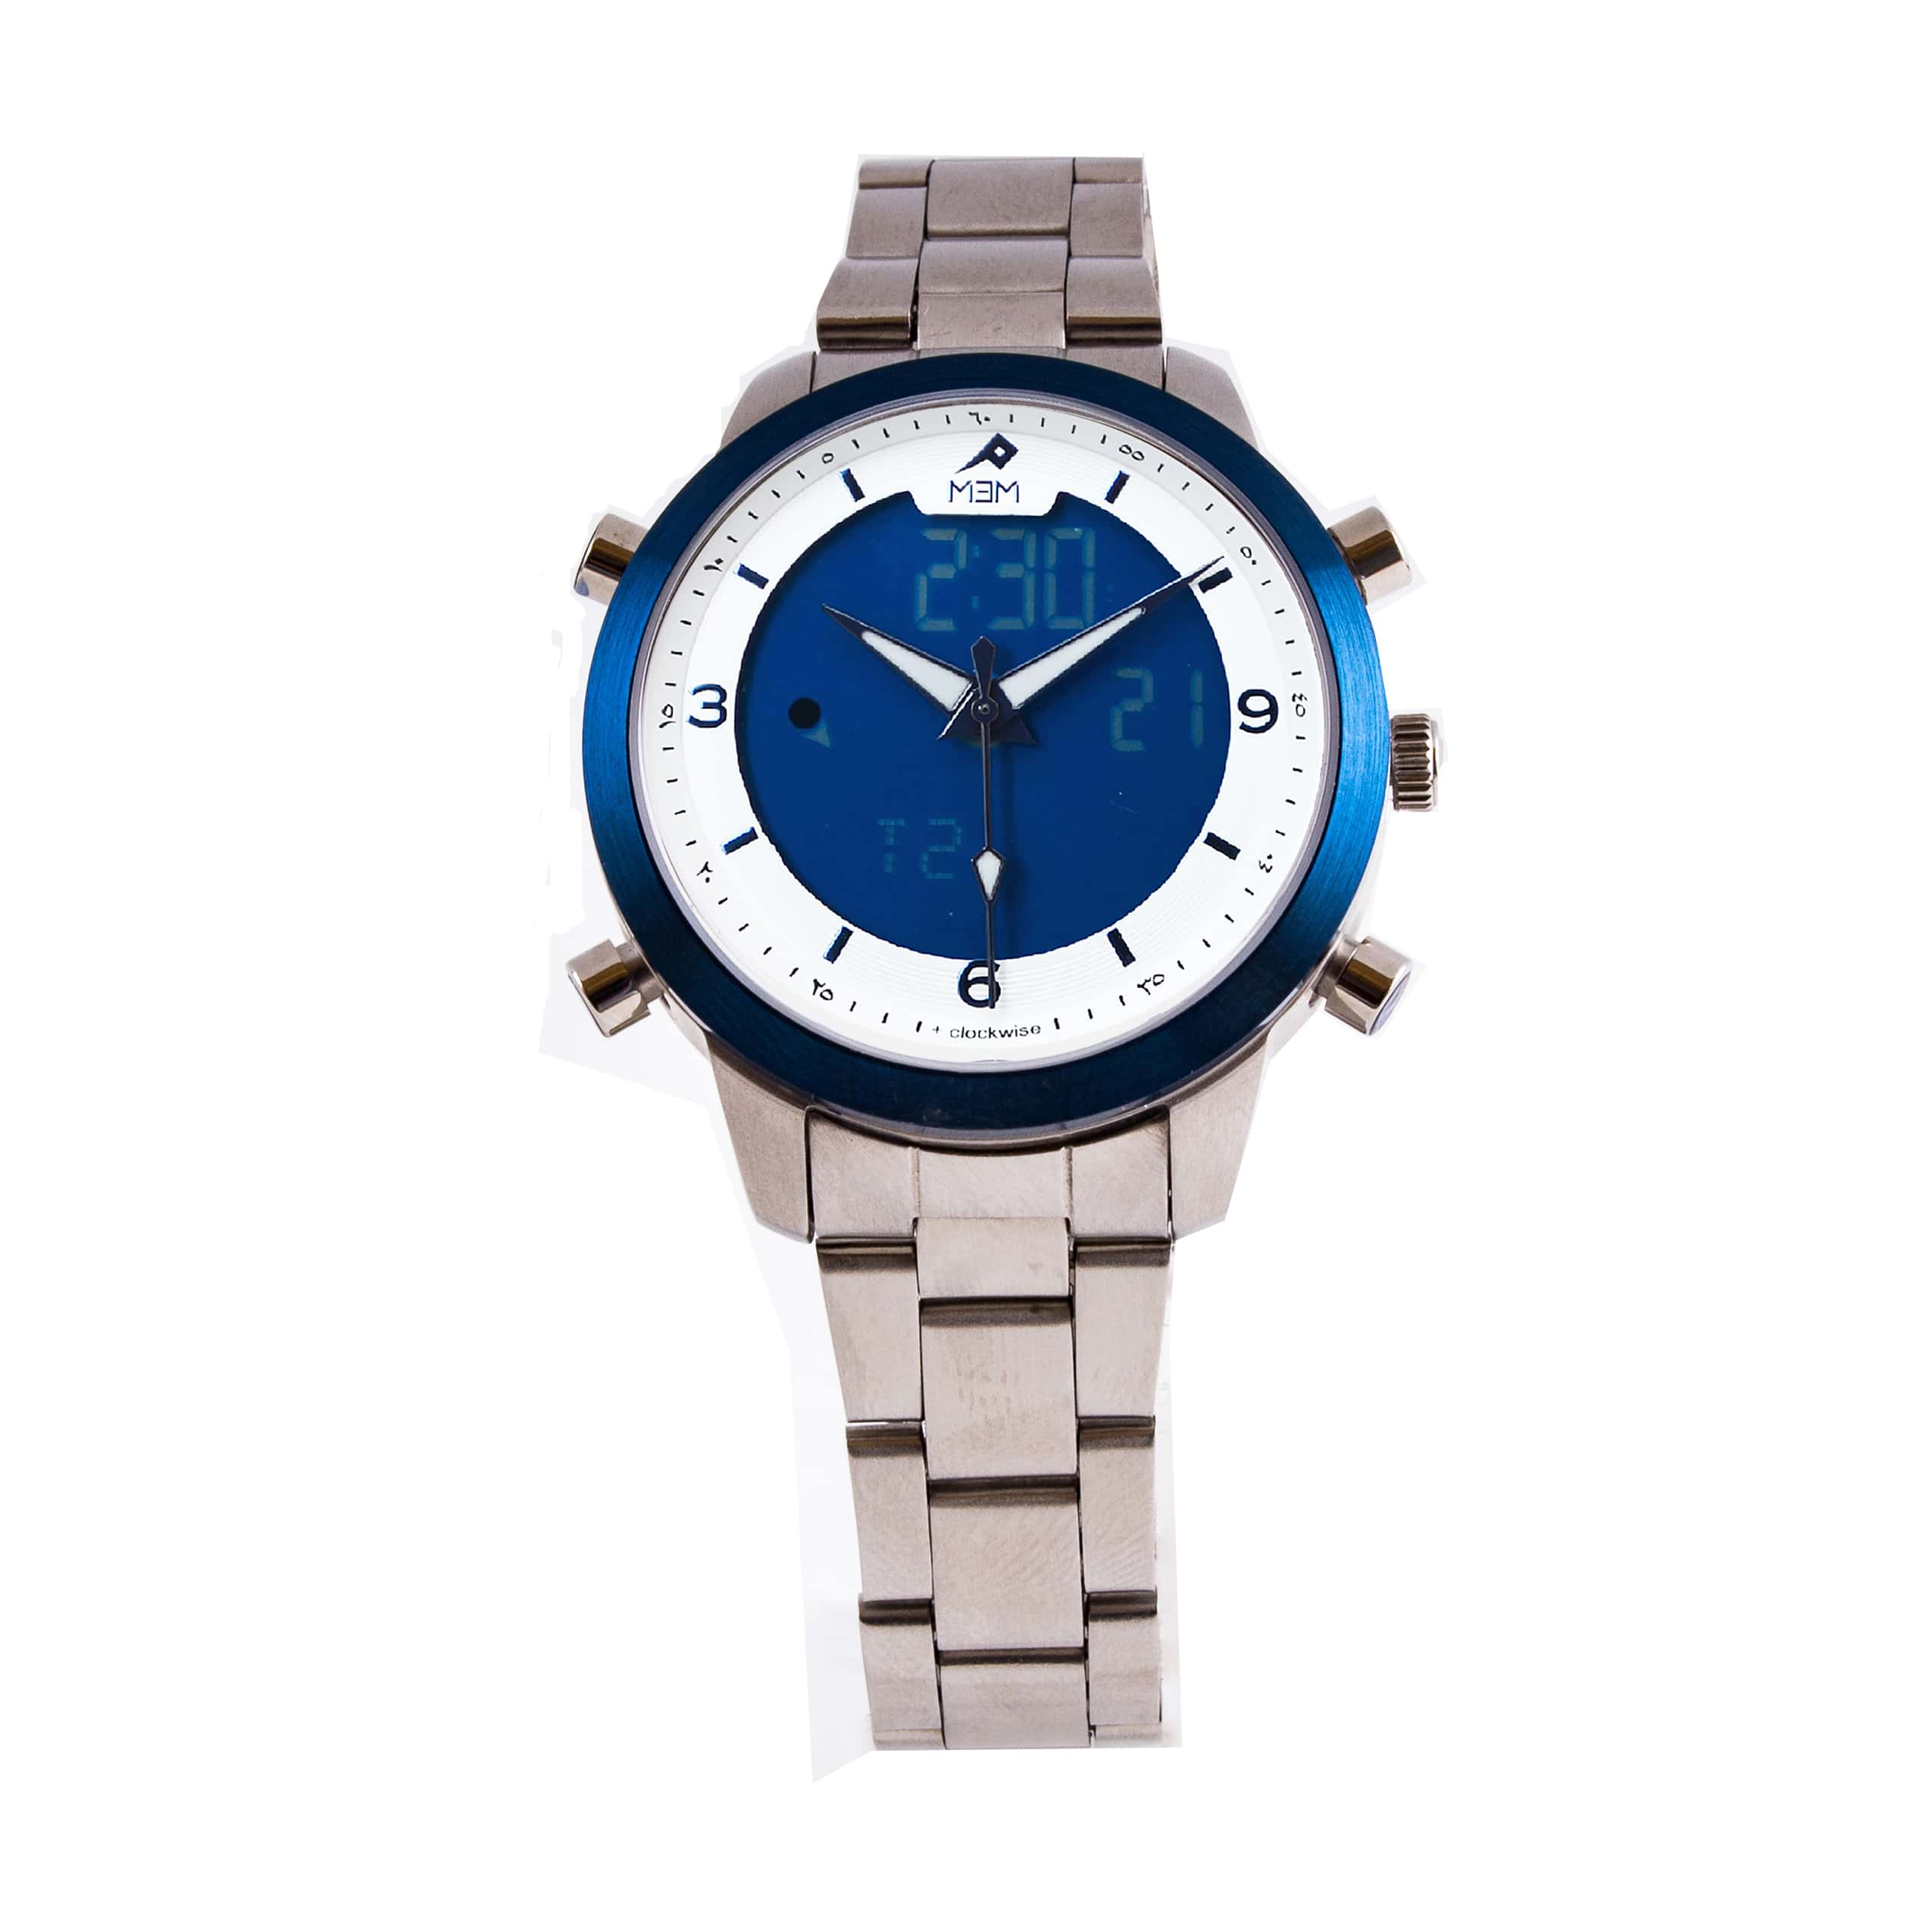 Mem aqua couple blue bezel mem watches malaysia for Aqua marine watches